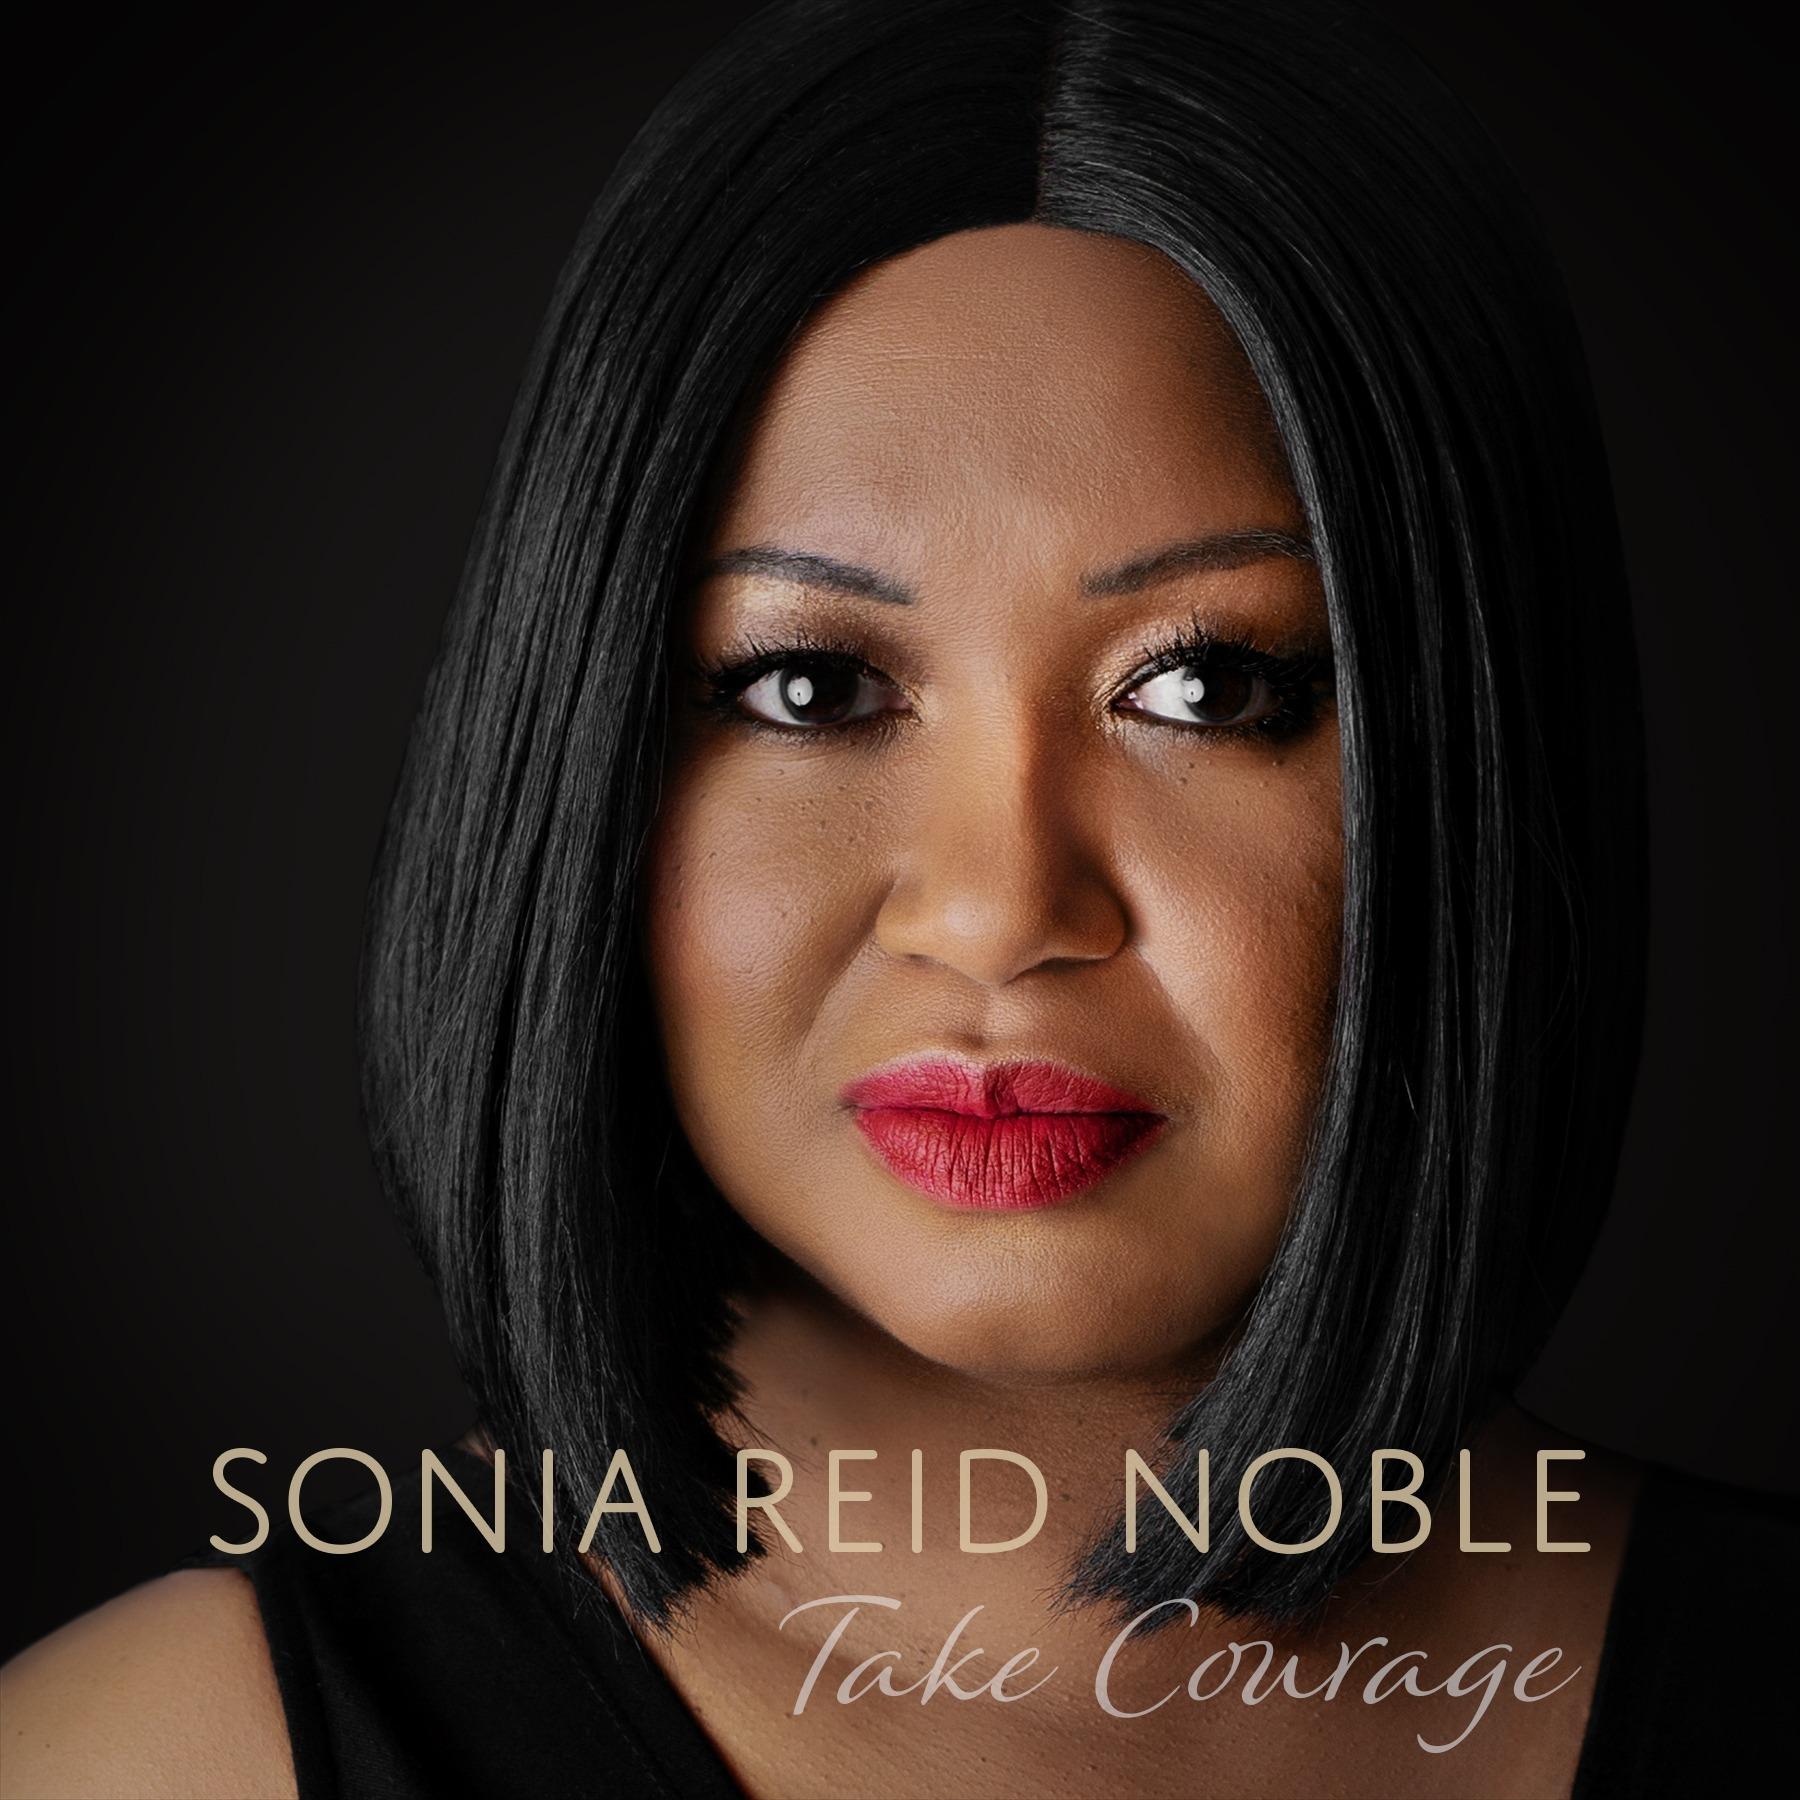 Sonia Reid Noble Album Release Concert with Special Guest Amora Soul